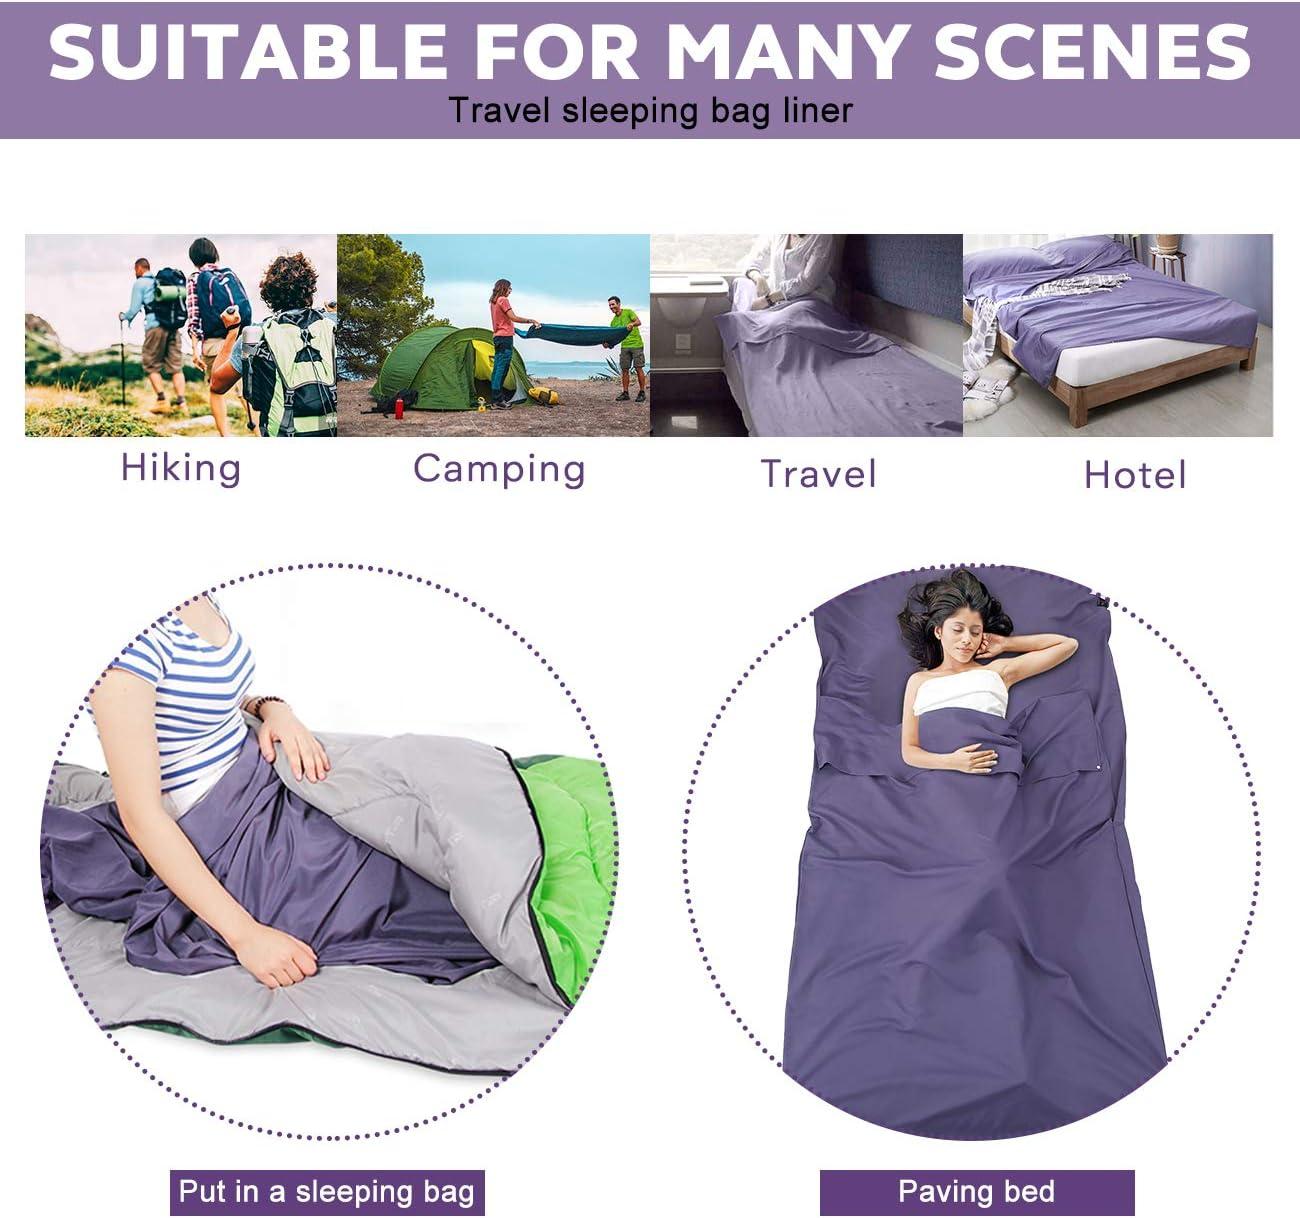 ASOOX Sleeping Bag Liner Cotton Lightweight Premium Comfortable Compact Camping Sheet Sleeping Bag Sack for HotelsTravel Backpacking Hiking Sleeping Sheet Travel Sack with Storage Bag